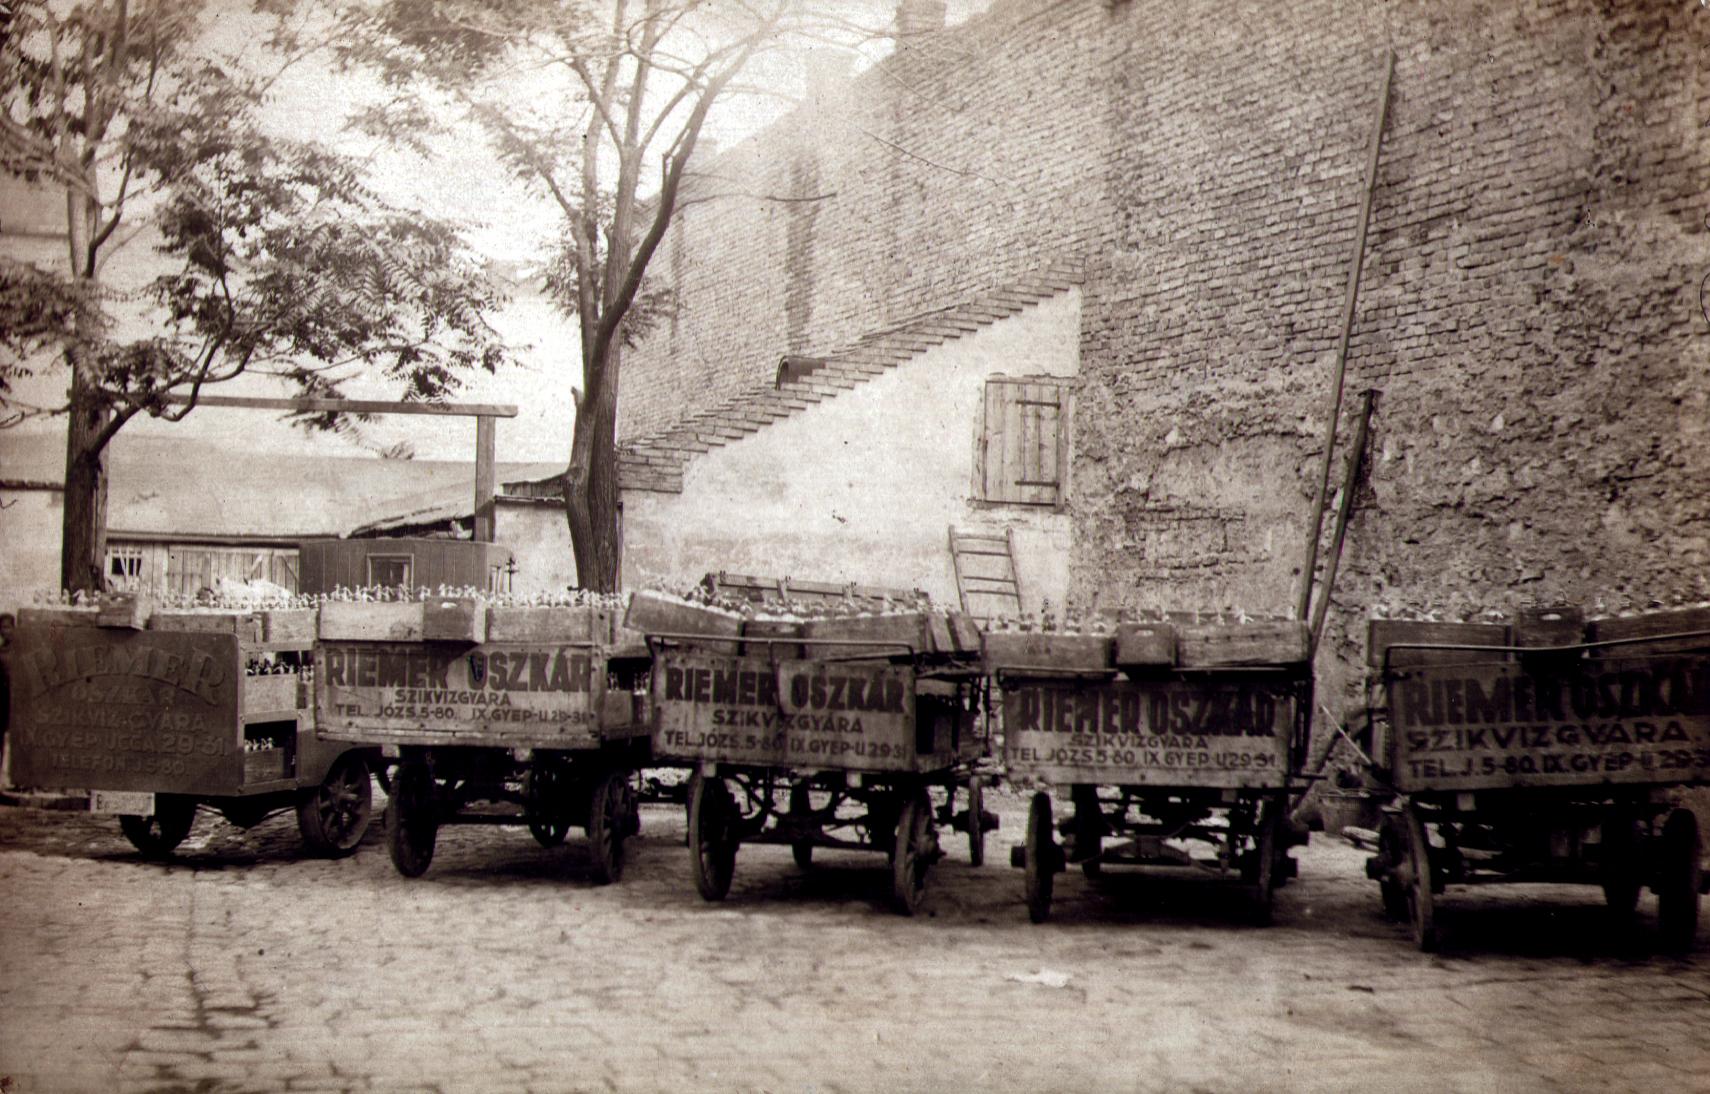 The soda-water wagons of the workshop of Ilona Seifert's father Oszkar Riemer